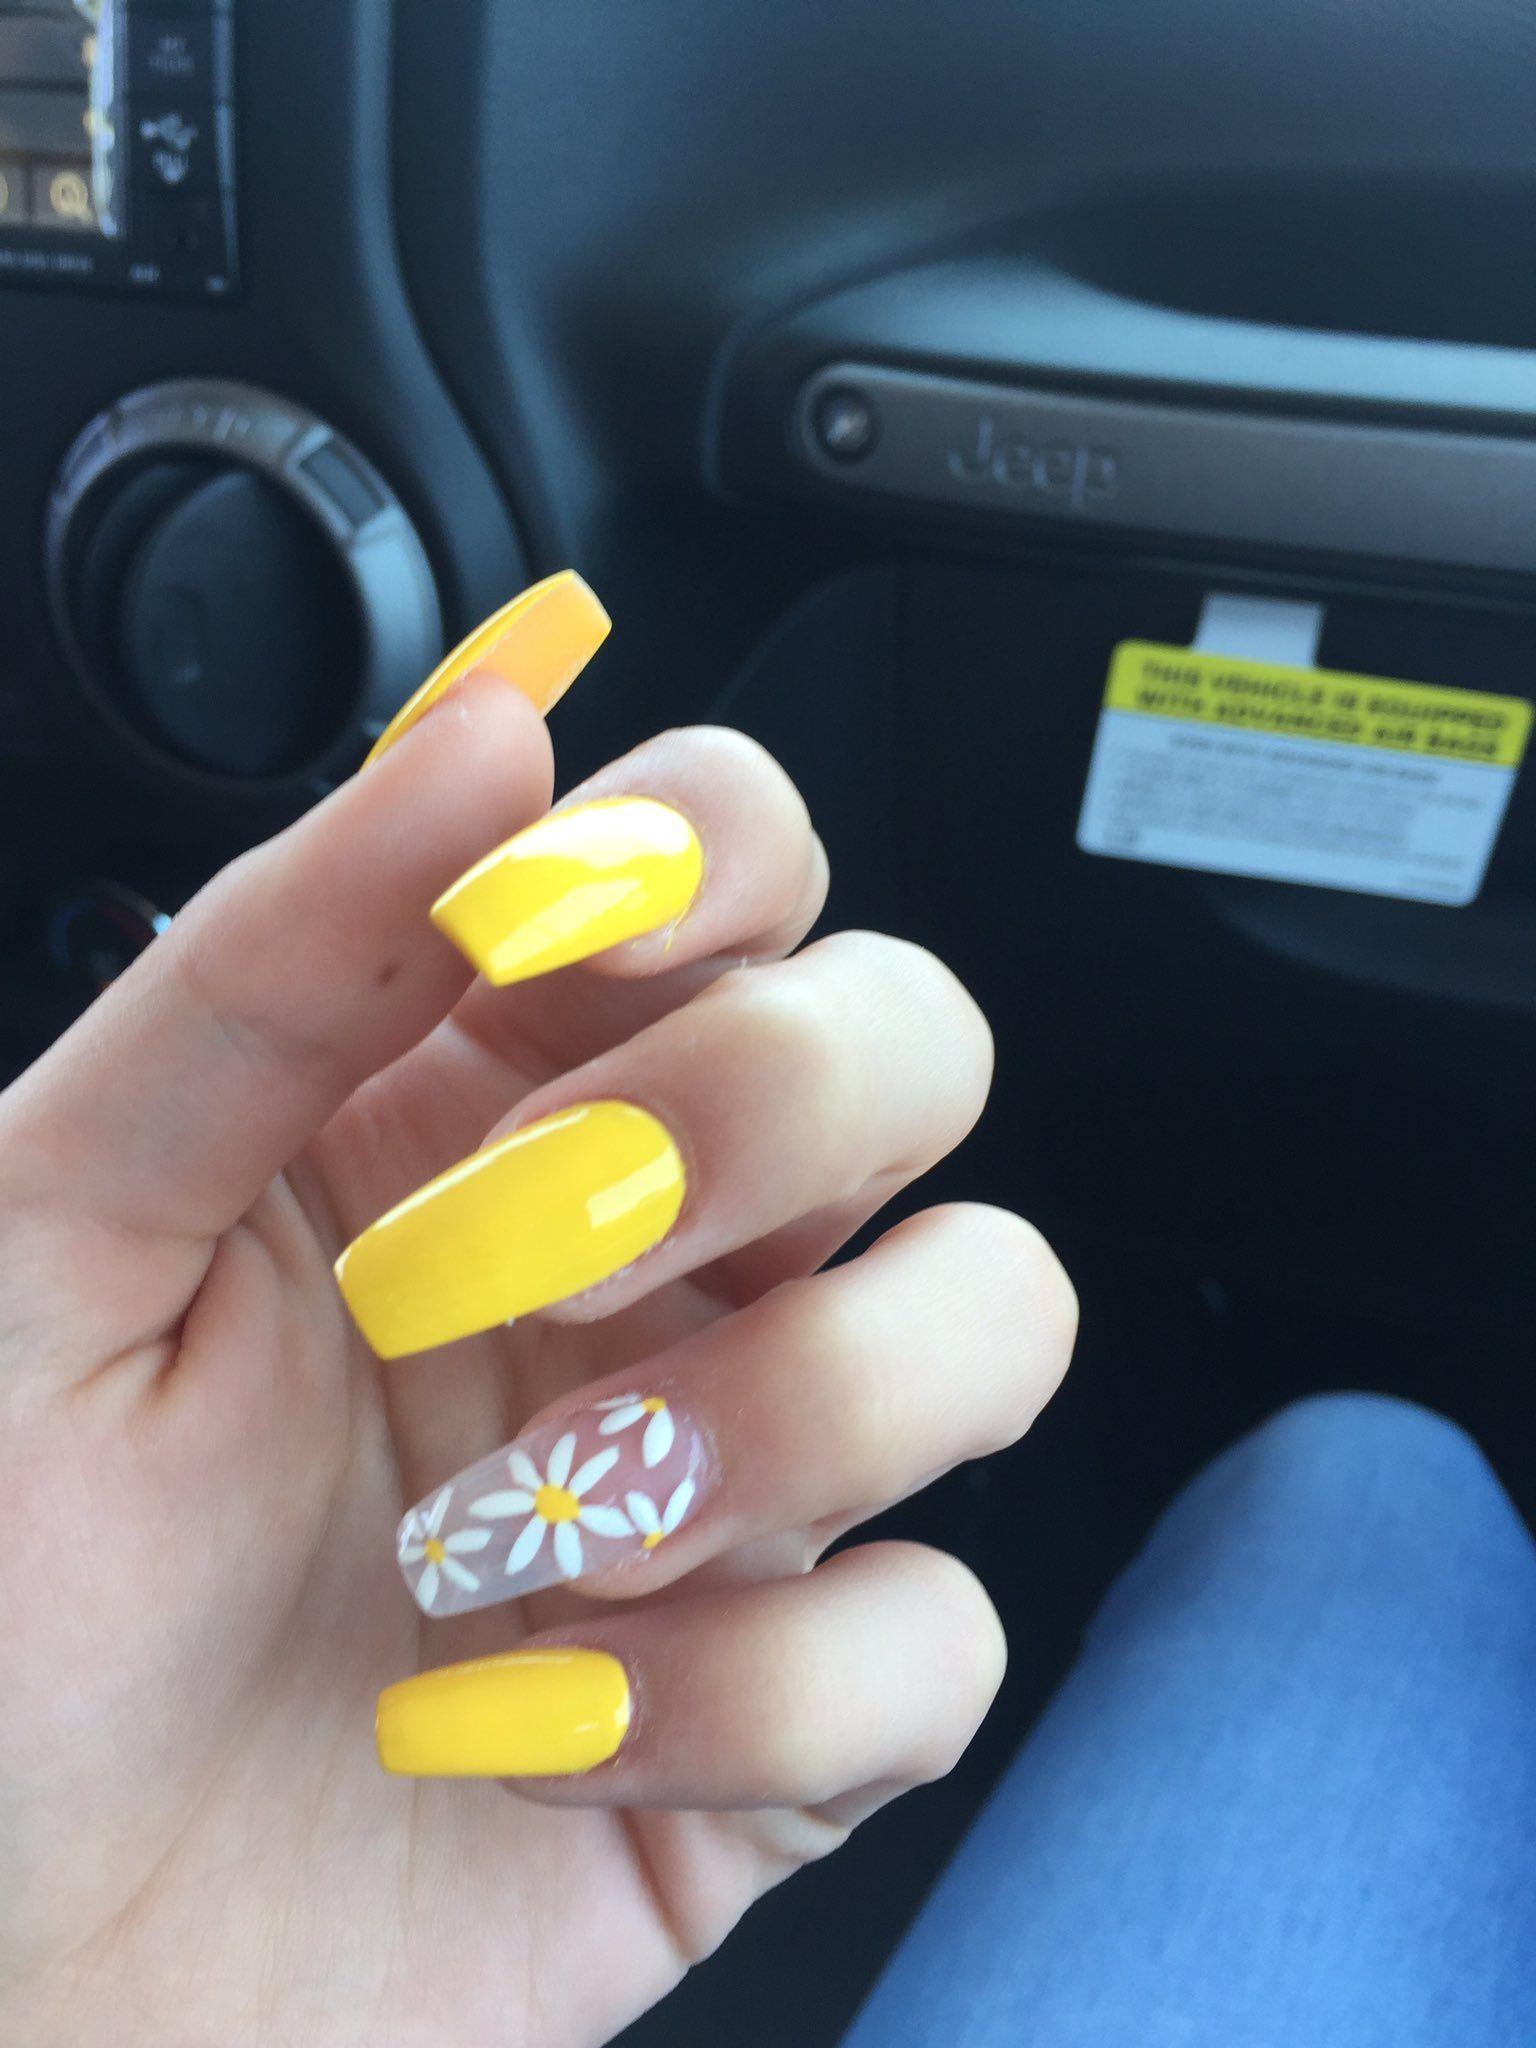 22 Beautiful Gel Nails Turning Yellow 30 Cute Nail Art That You Will Love 22 Beautiful Gel Nails Turning Yellow Why Sunflower Nails Yellow Nails Fake Nails